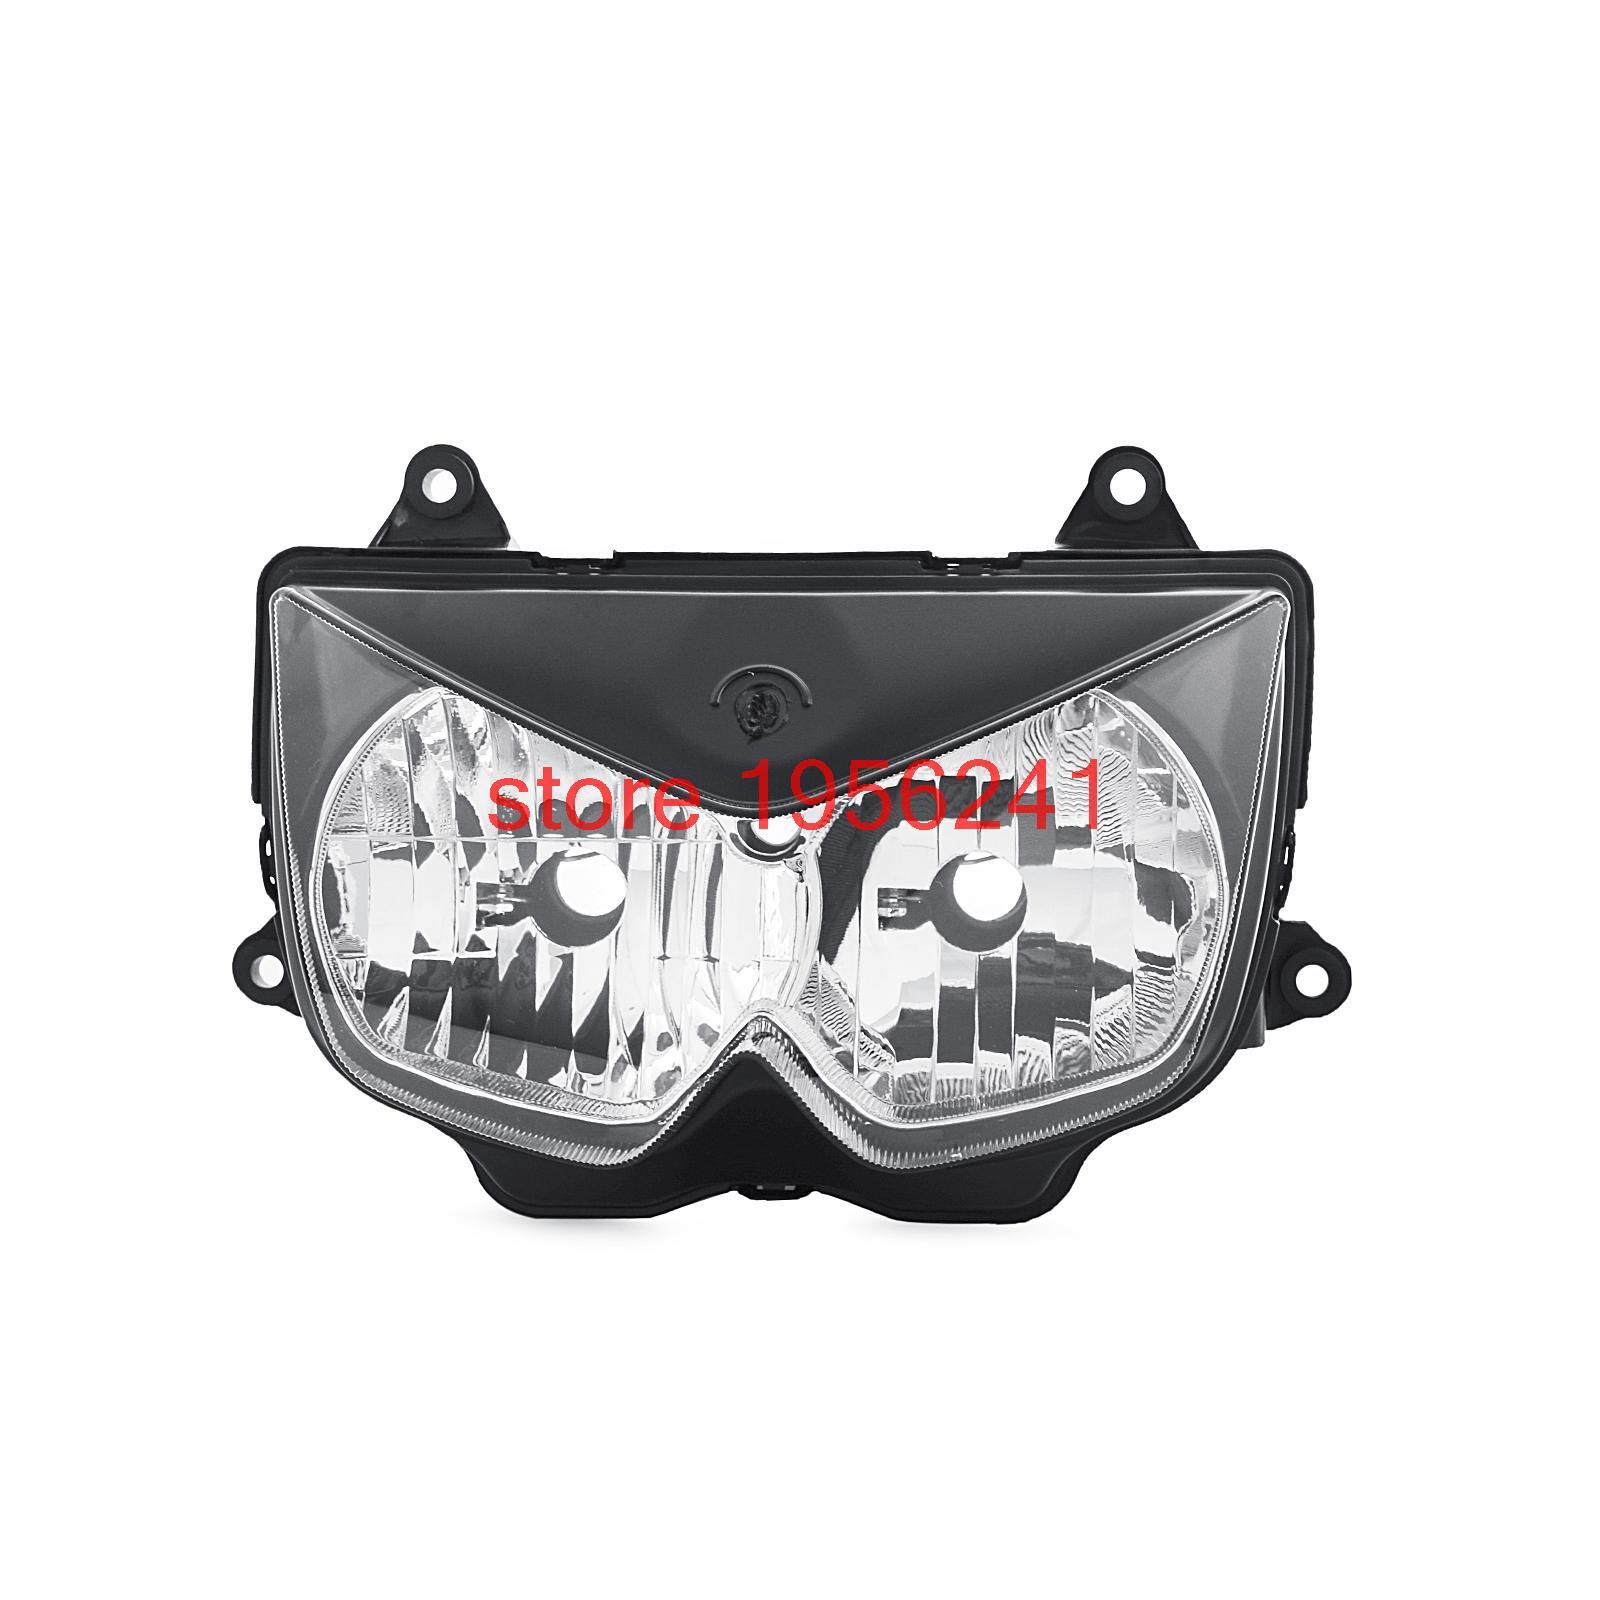 Motorcycle ABS Plastic Clear Lens Headlights Head light Headlamp For Kawasaki KLE500 KLE500B 2005 2006 2007 KLE 500 500B for kawasaki kle500 1991 2007 foldable extendable brake levers folding kle 500 92 93 94 95 96 97 98 99 00 01 02 03 04 05 2006